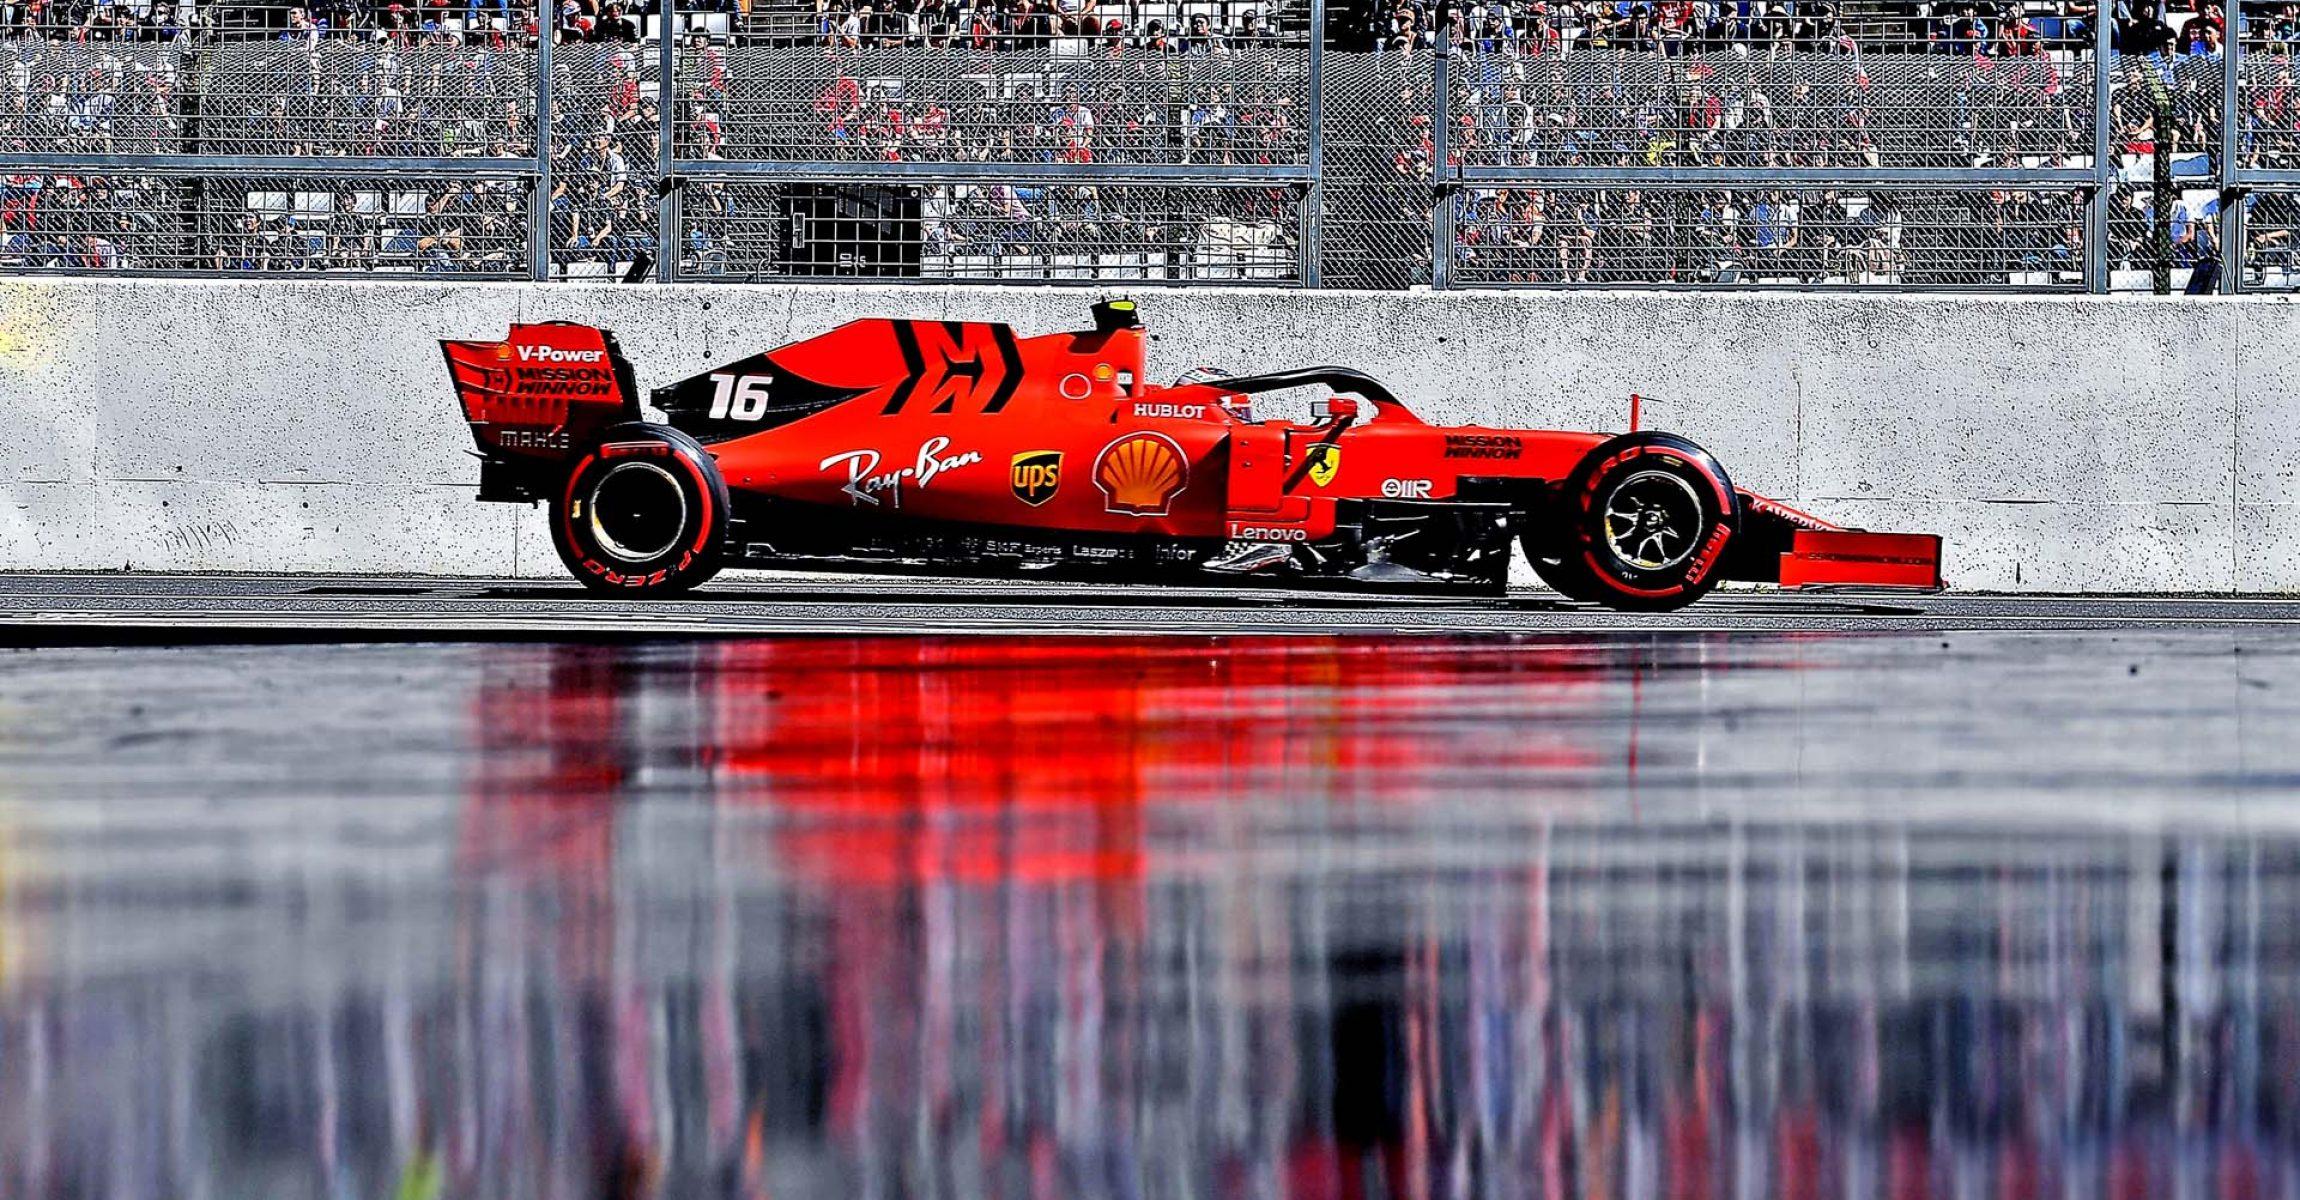 GP GIAPPONE F1/2019 - DOMENICA 13/10/2019 credit: @Scuderia Ferrari Press Office Charles Leclerc